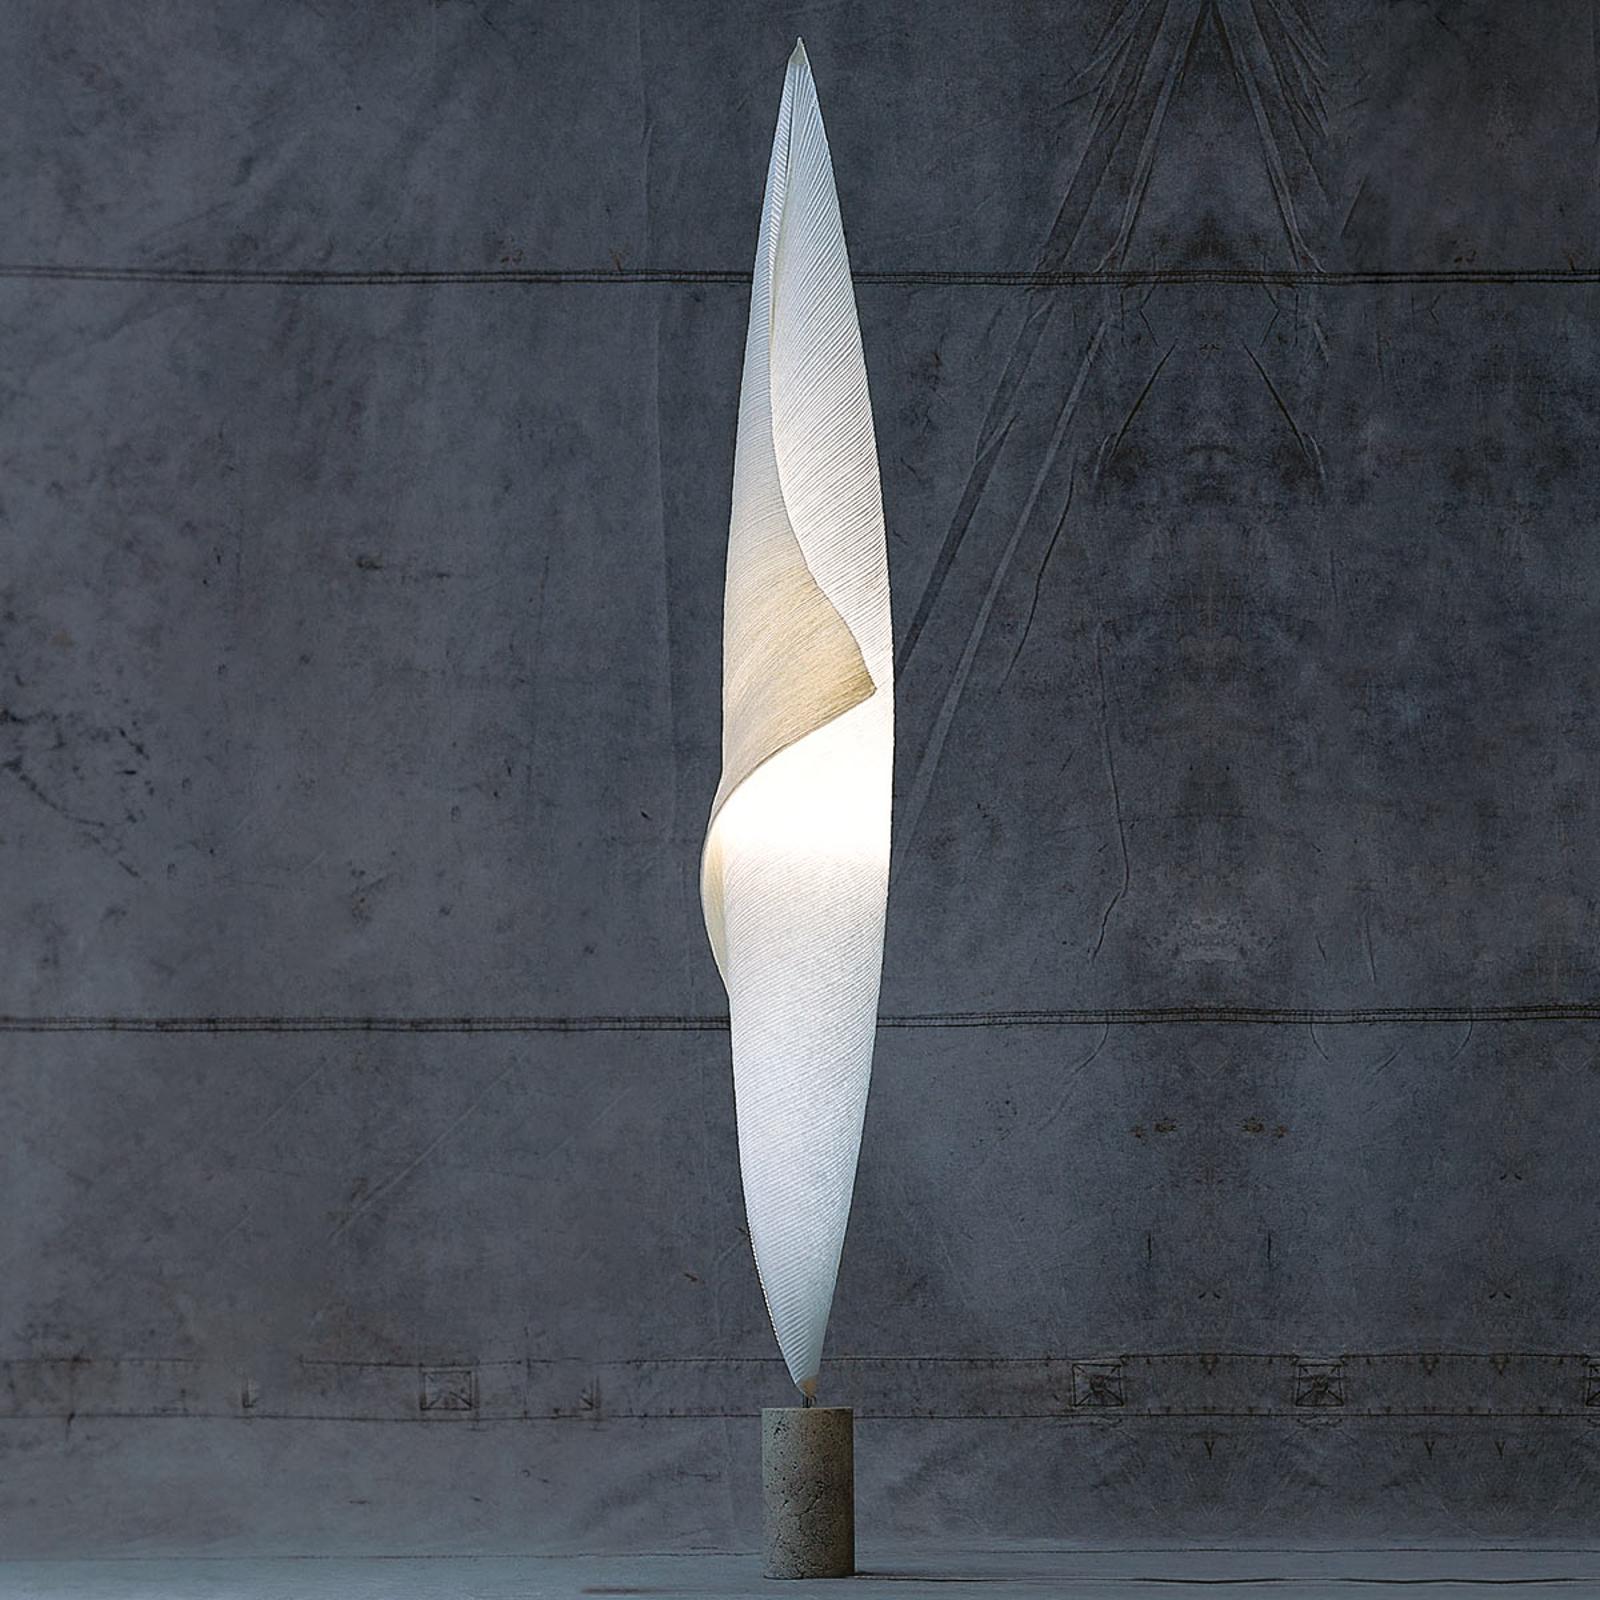 Kokonglignende gulvlampe Wo-Tum-Bu 1 med dimmer